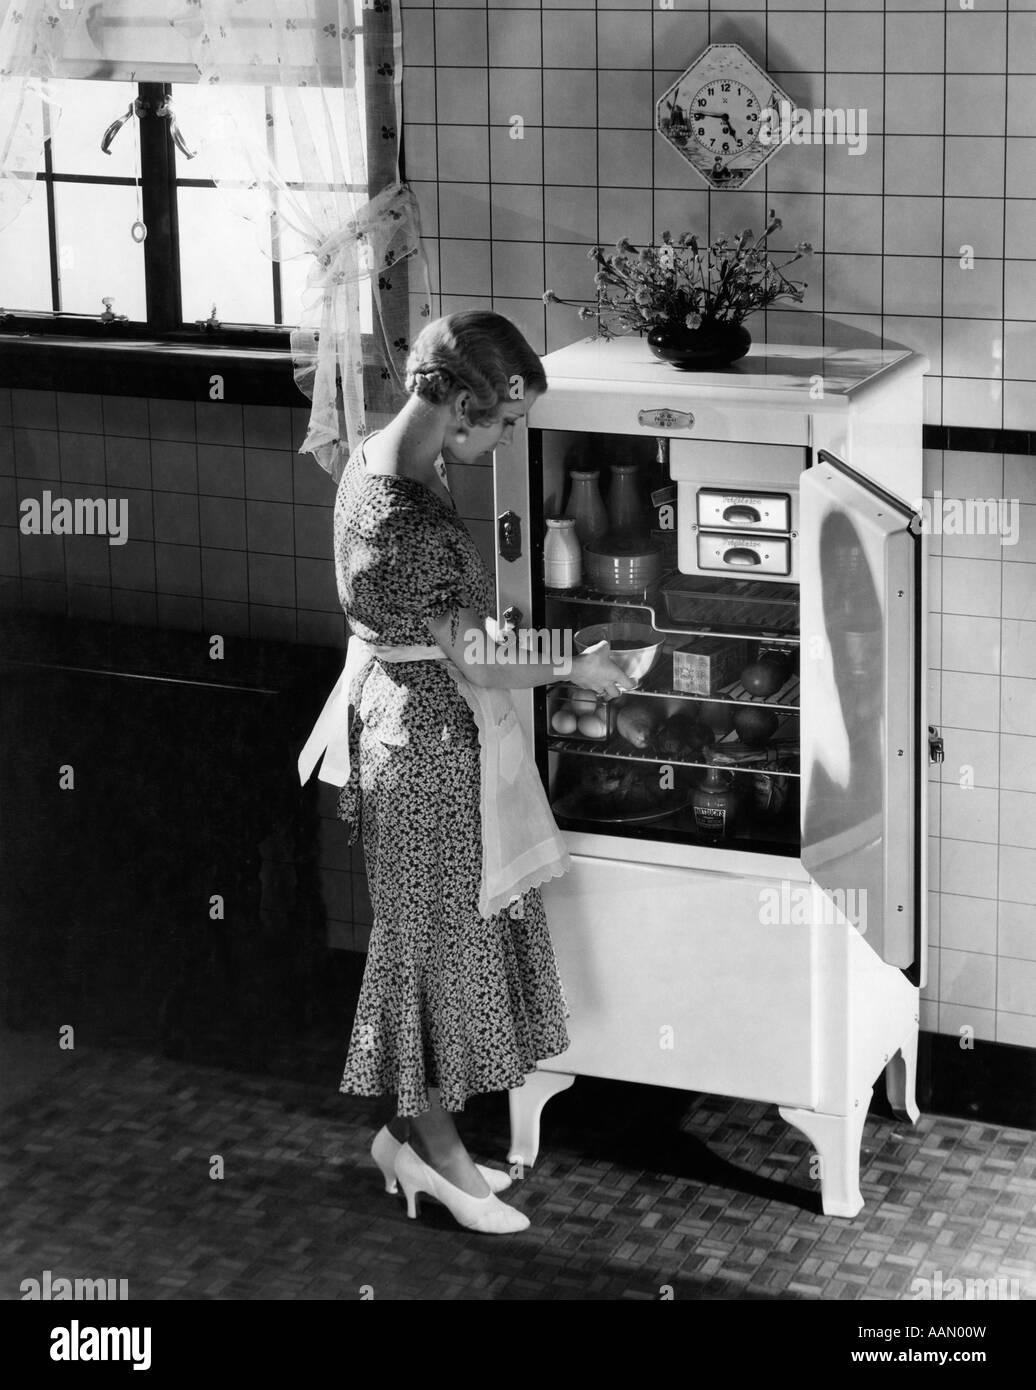 1920s Kitchen Stock Photos Images Alamy 1930s Blond Woman Apron